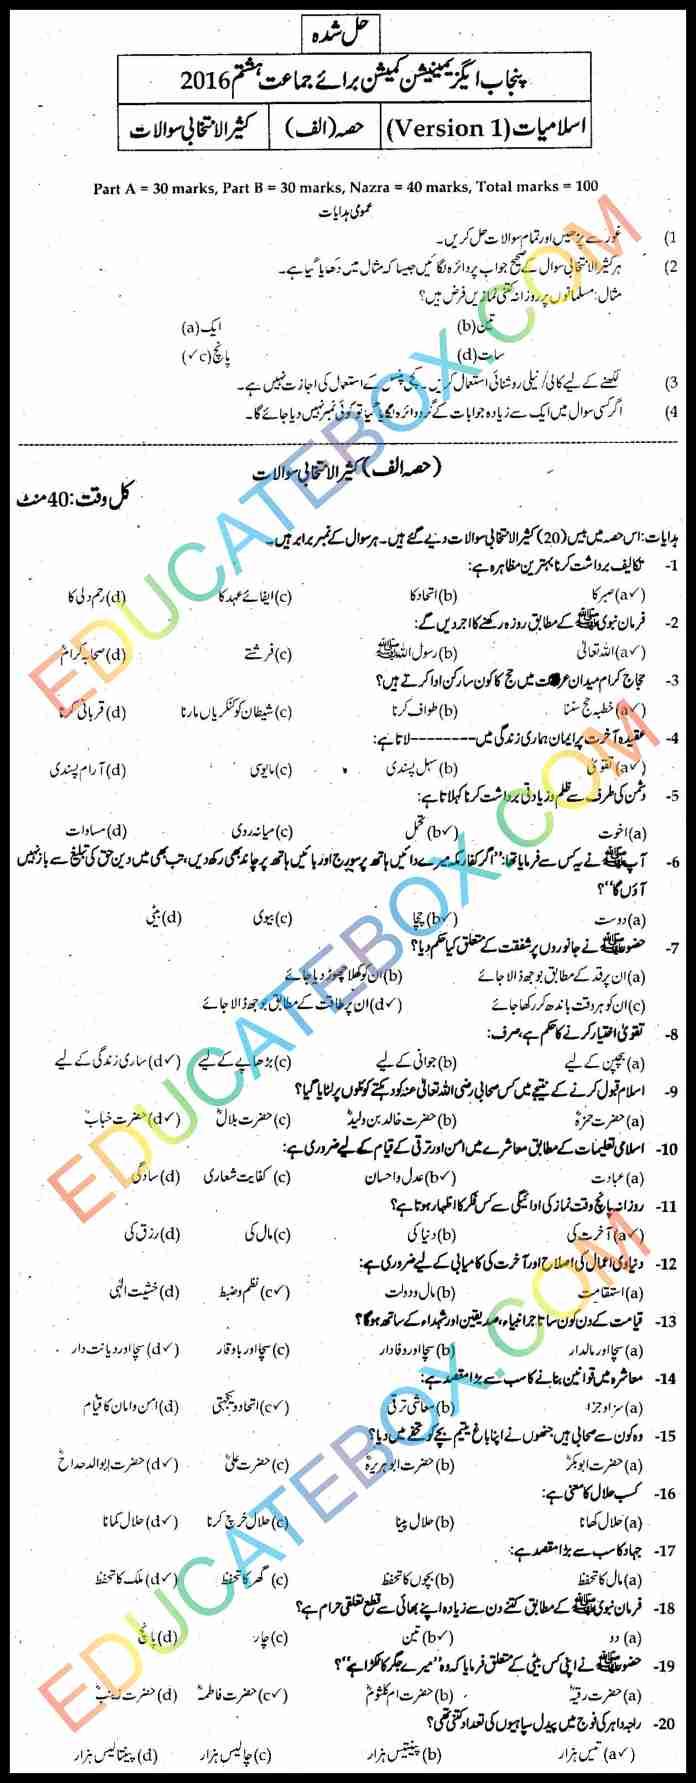 Past Paper 8th Class Islamiyat 2016 Solved Paper Punjab Board (PEC) Objective Type Version 1 اپ ٹو ڈیٹ پیپر آٹھویں کلاس اسلامیات 2016 حل شدہ پیپر پنجاب بورڈ آبجیکٹیو ٹائپ۔ ورژن1